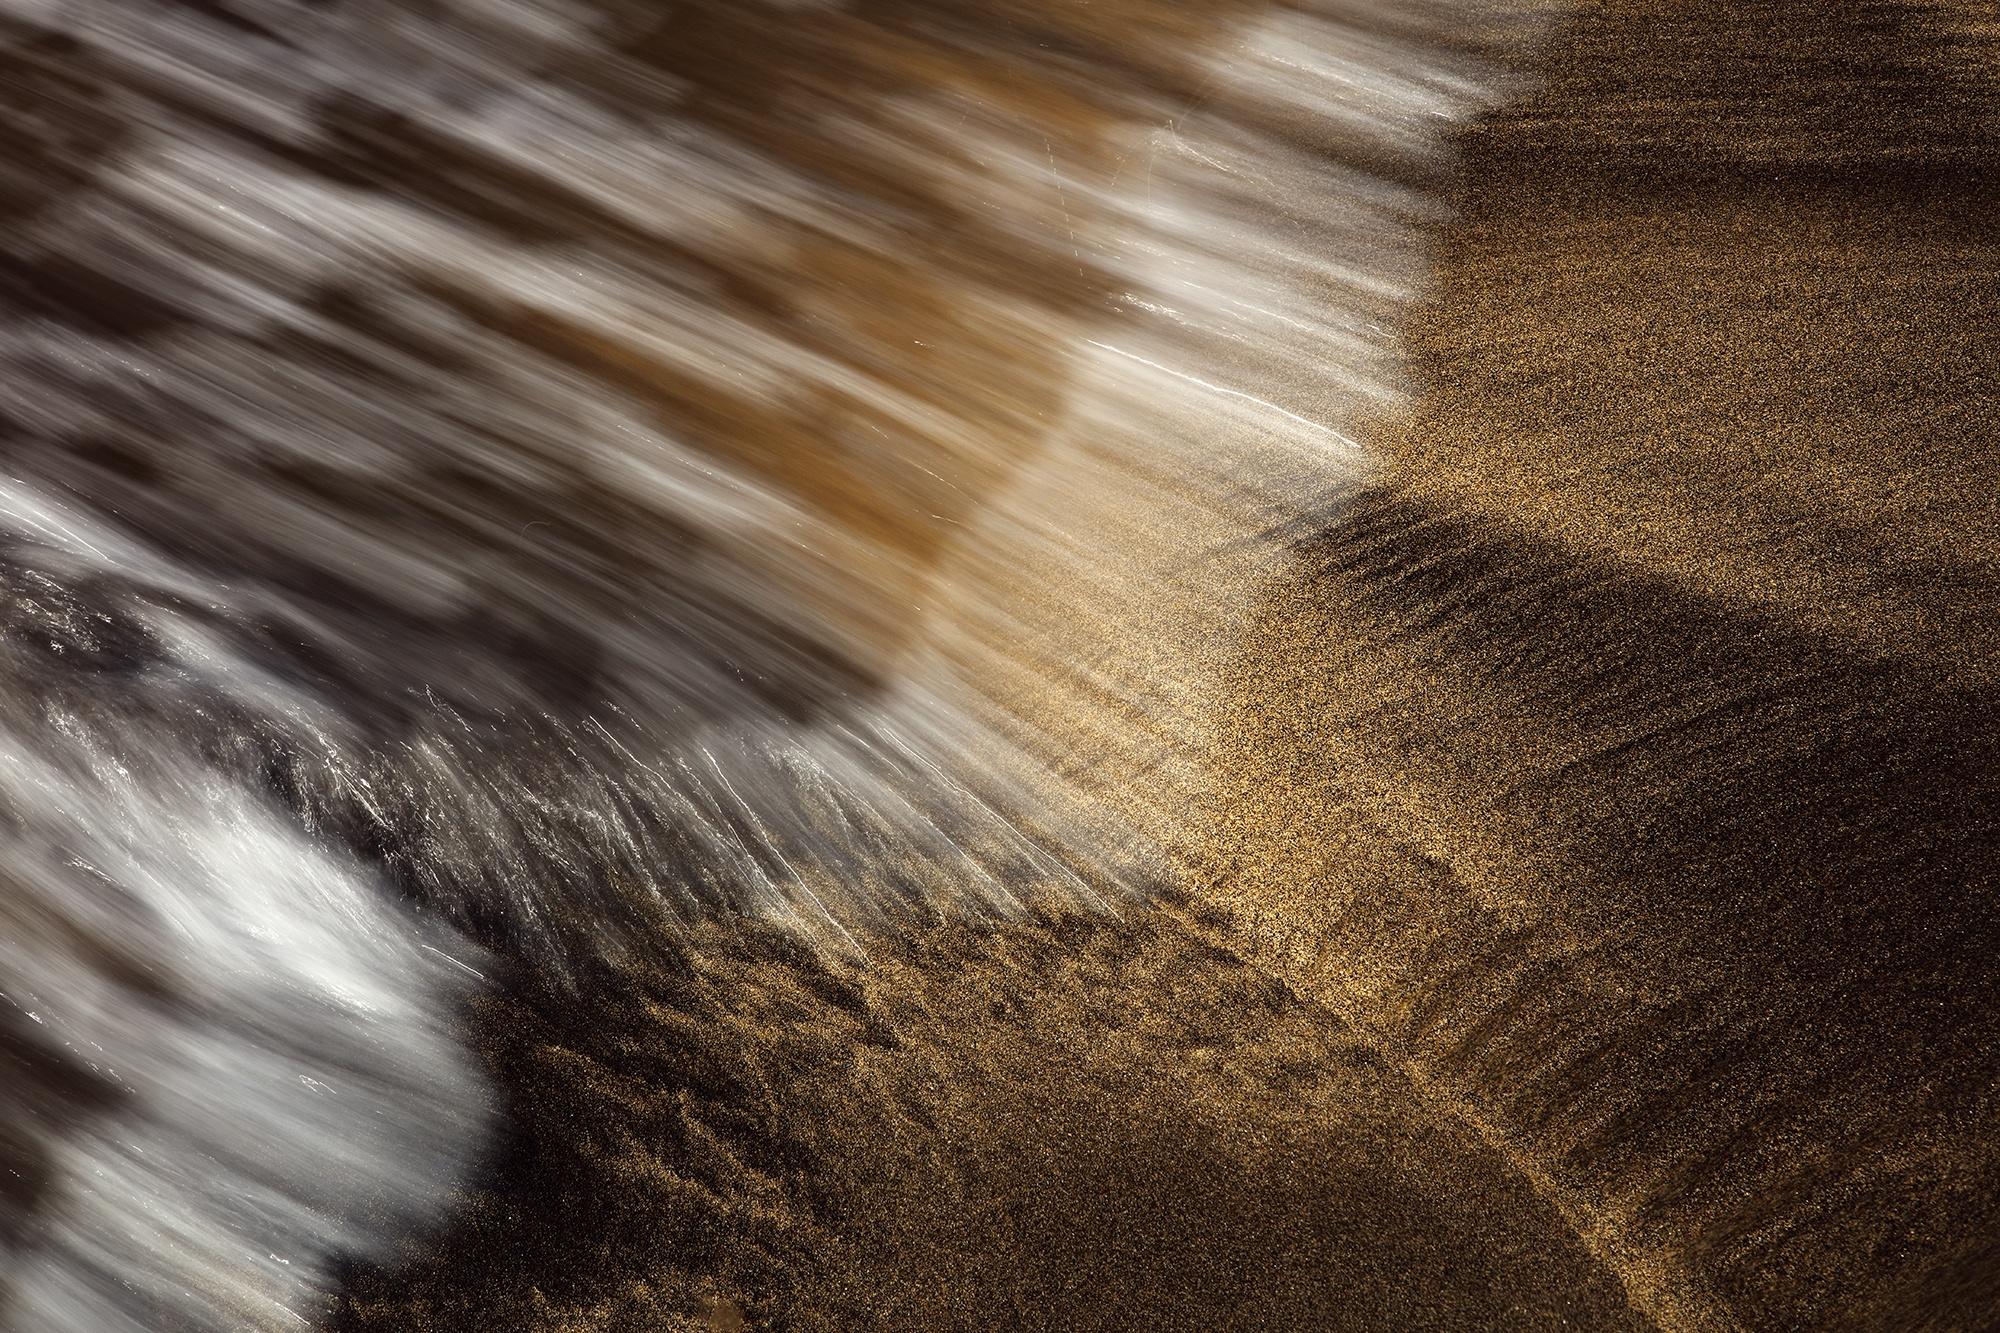 Efímeras - Isabel Díez, landscape photography